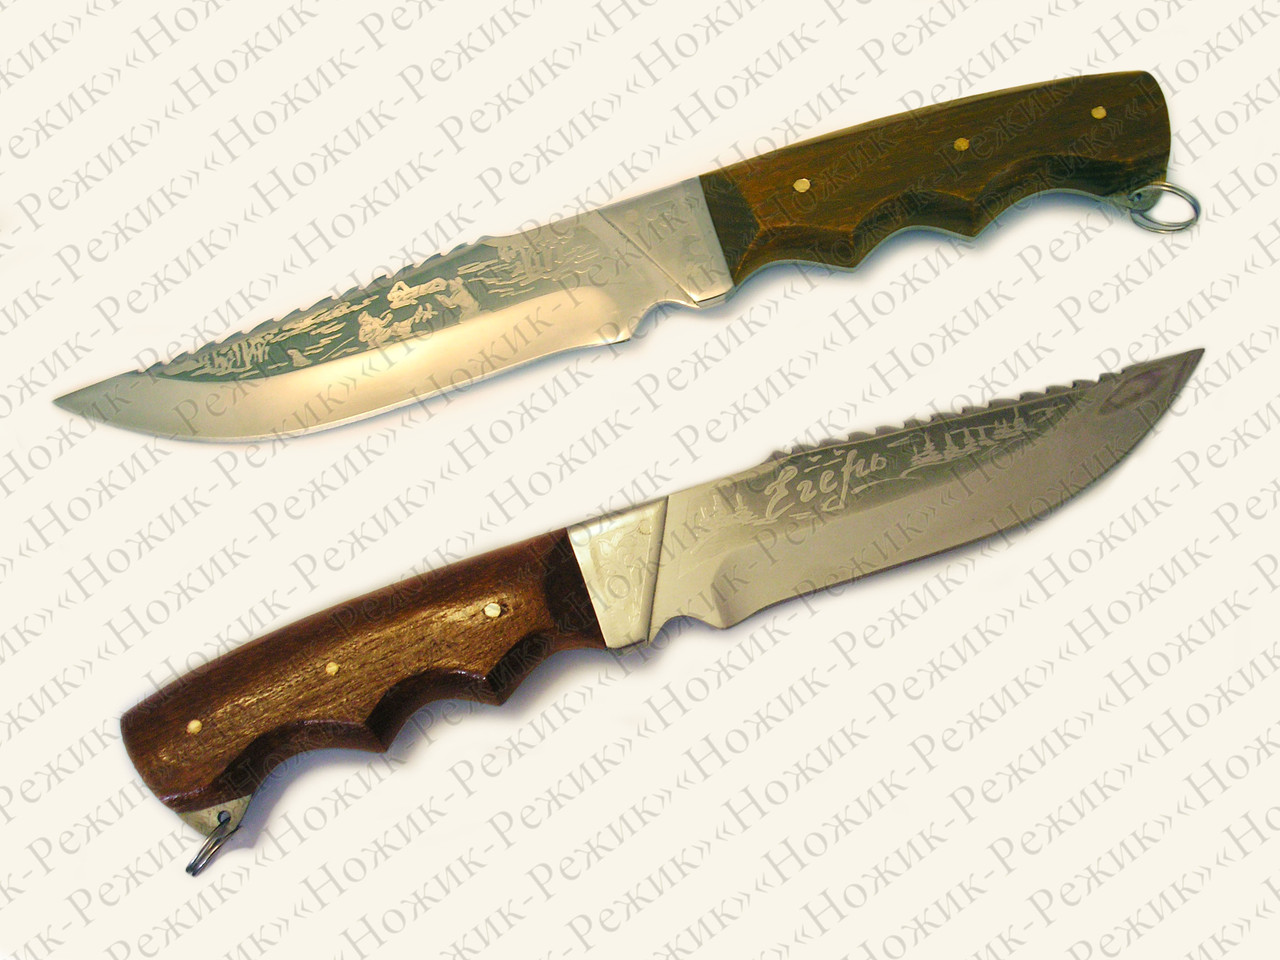 Ножи от производителя, рыбацкий нож, ножи охотничьи, туристические ножи, ножи ручной работы, туристический нож